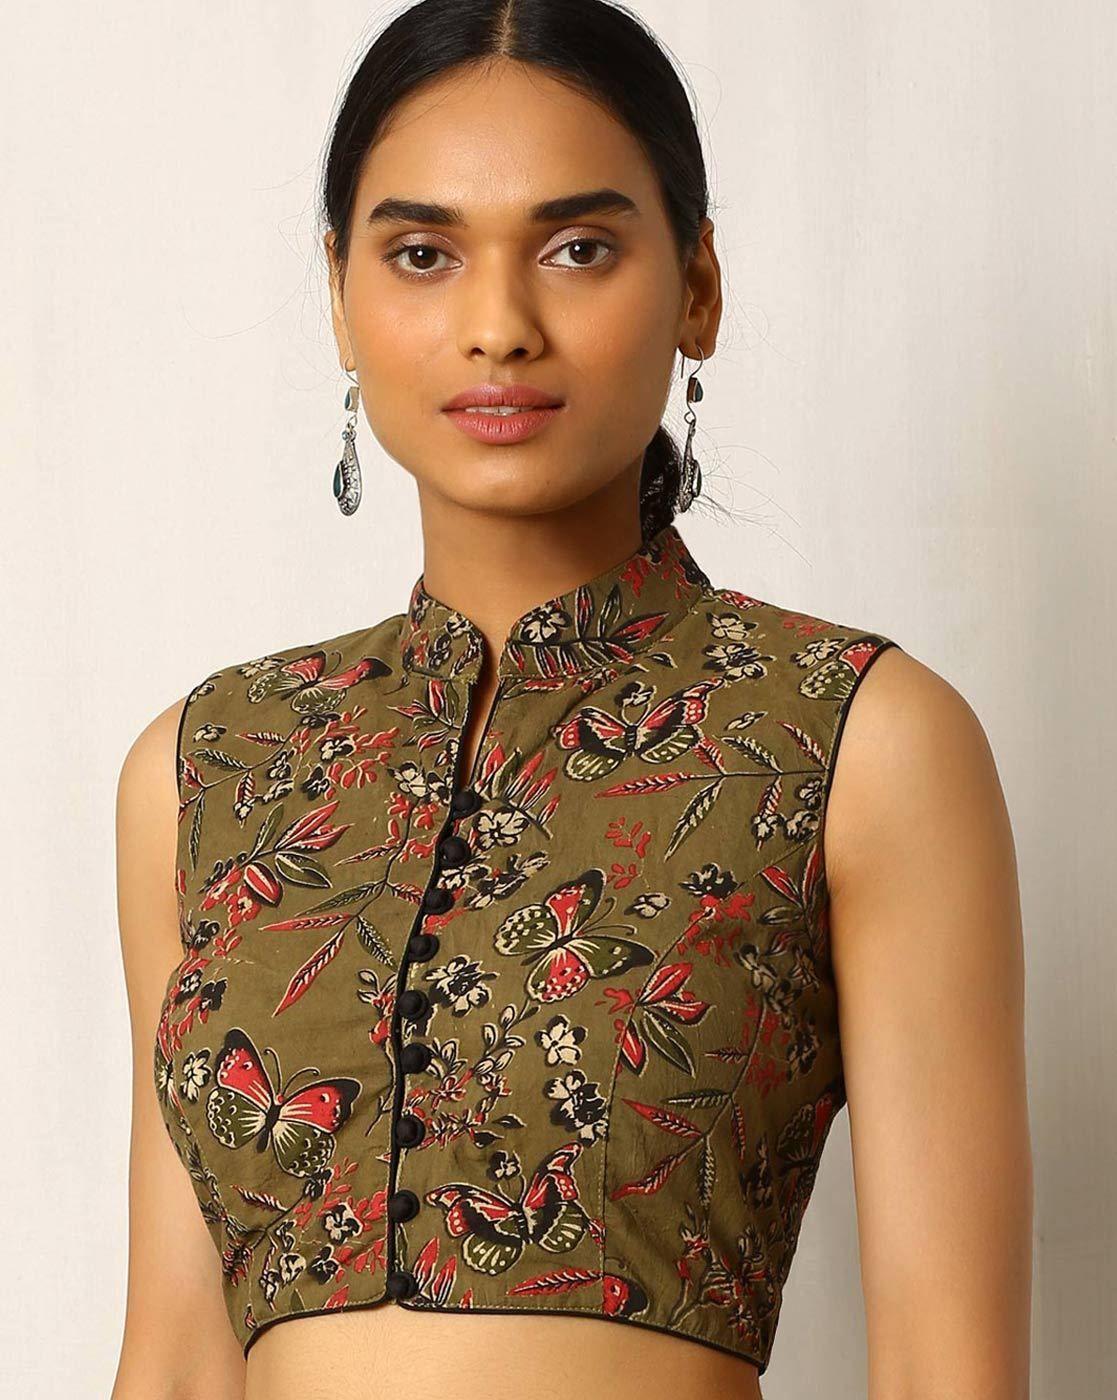 451349e5016292 Buy Olive Green Indie Picks Kalamkari Print Sleeveless Cotton Blouse Saree  Jacket Designs